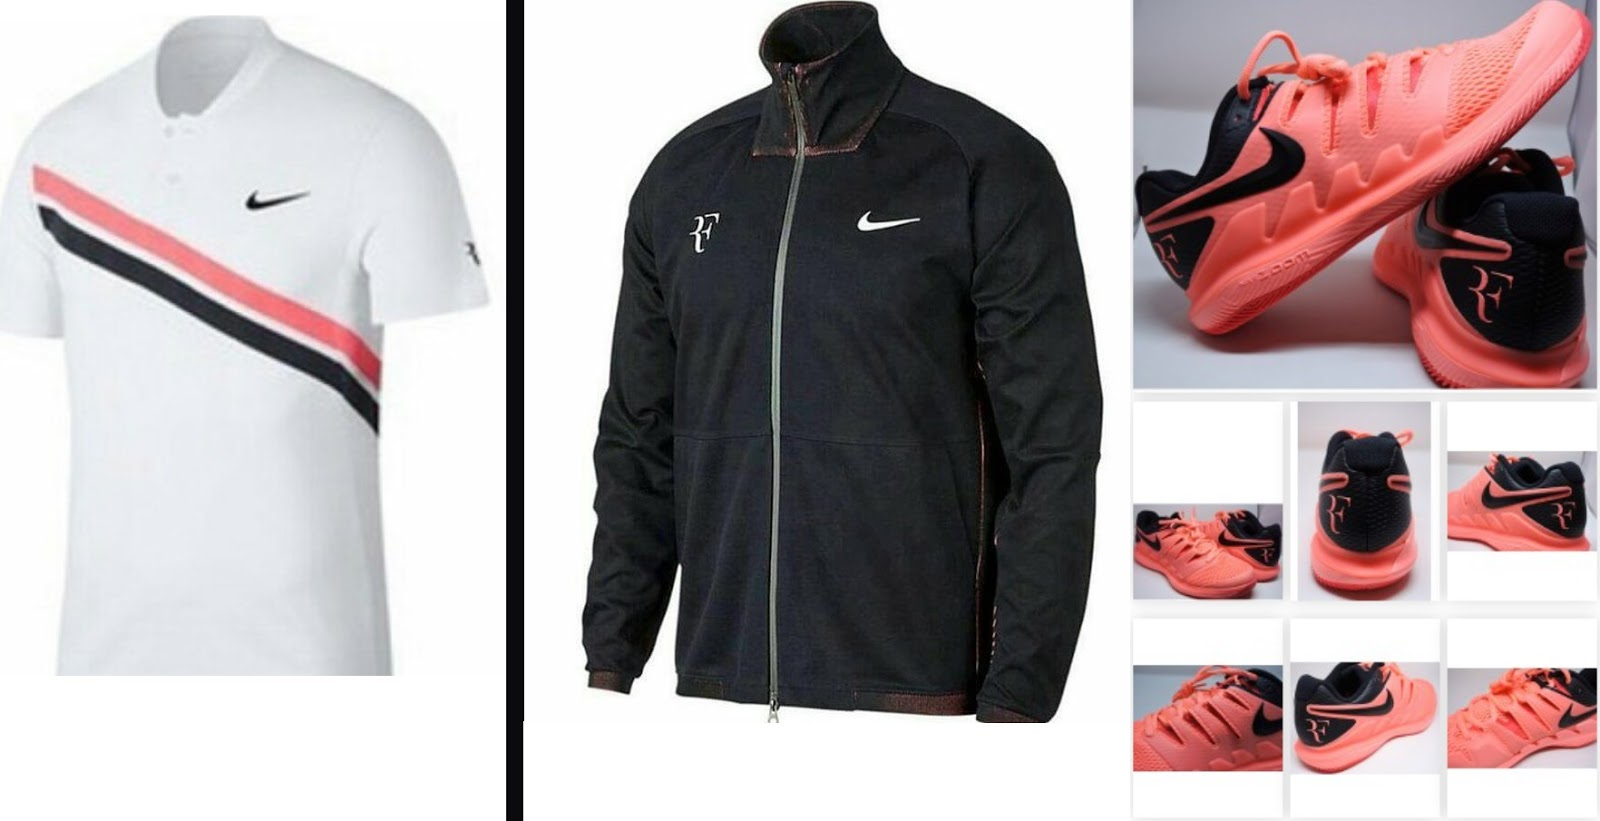 Federer outfit nike for Australian Open 2018